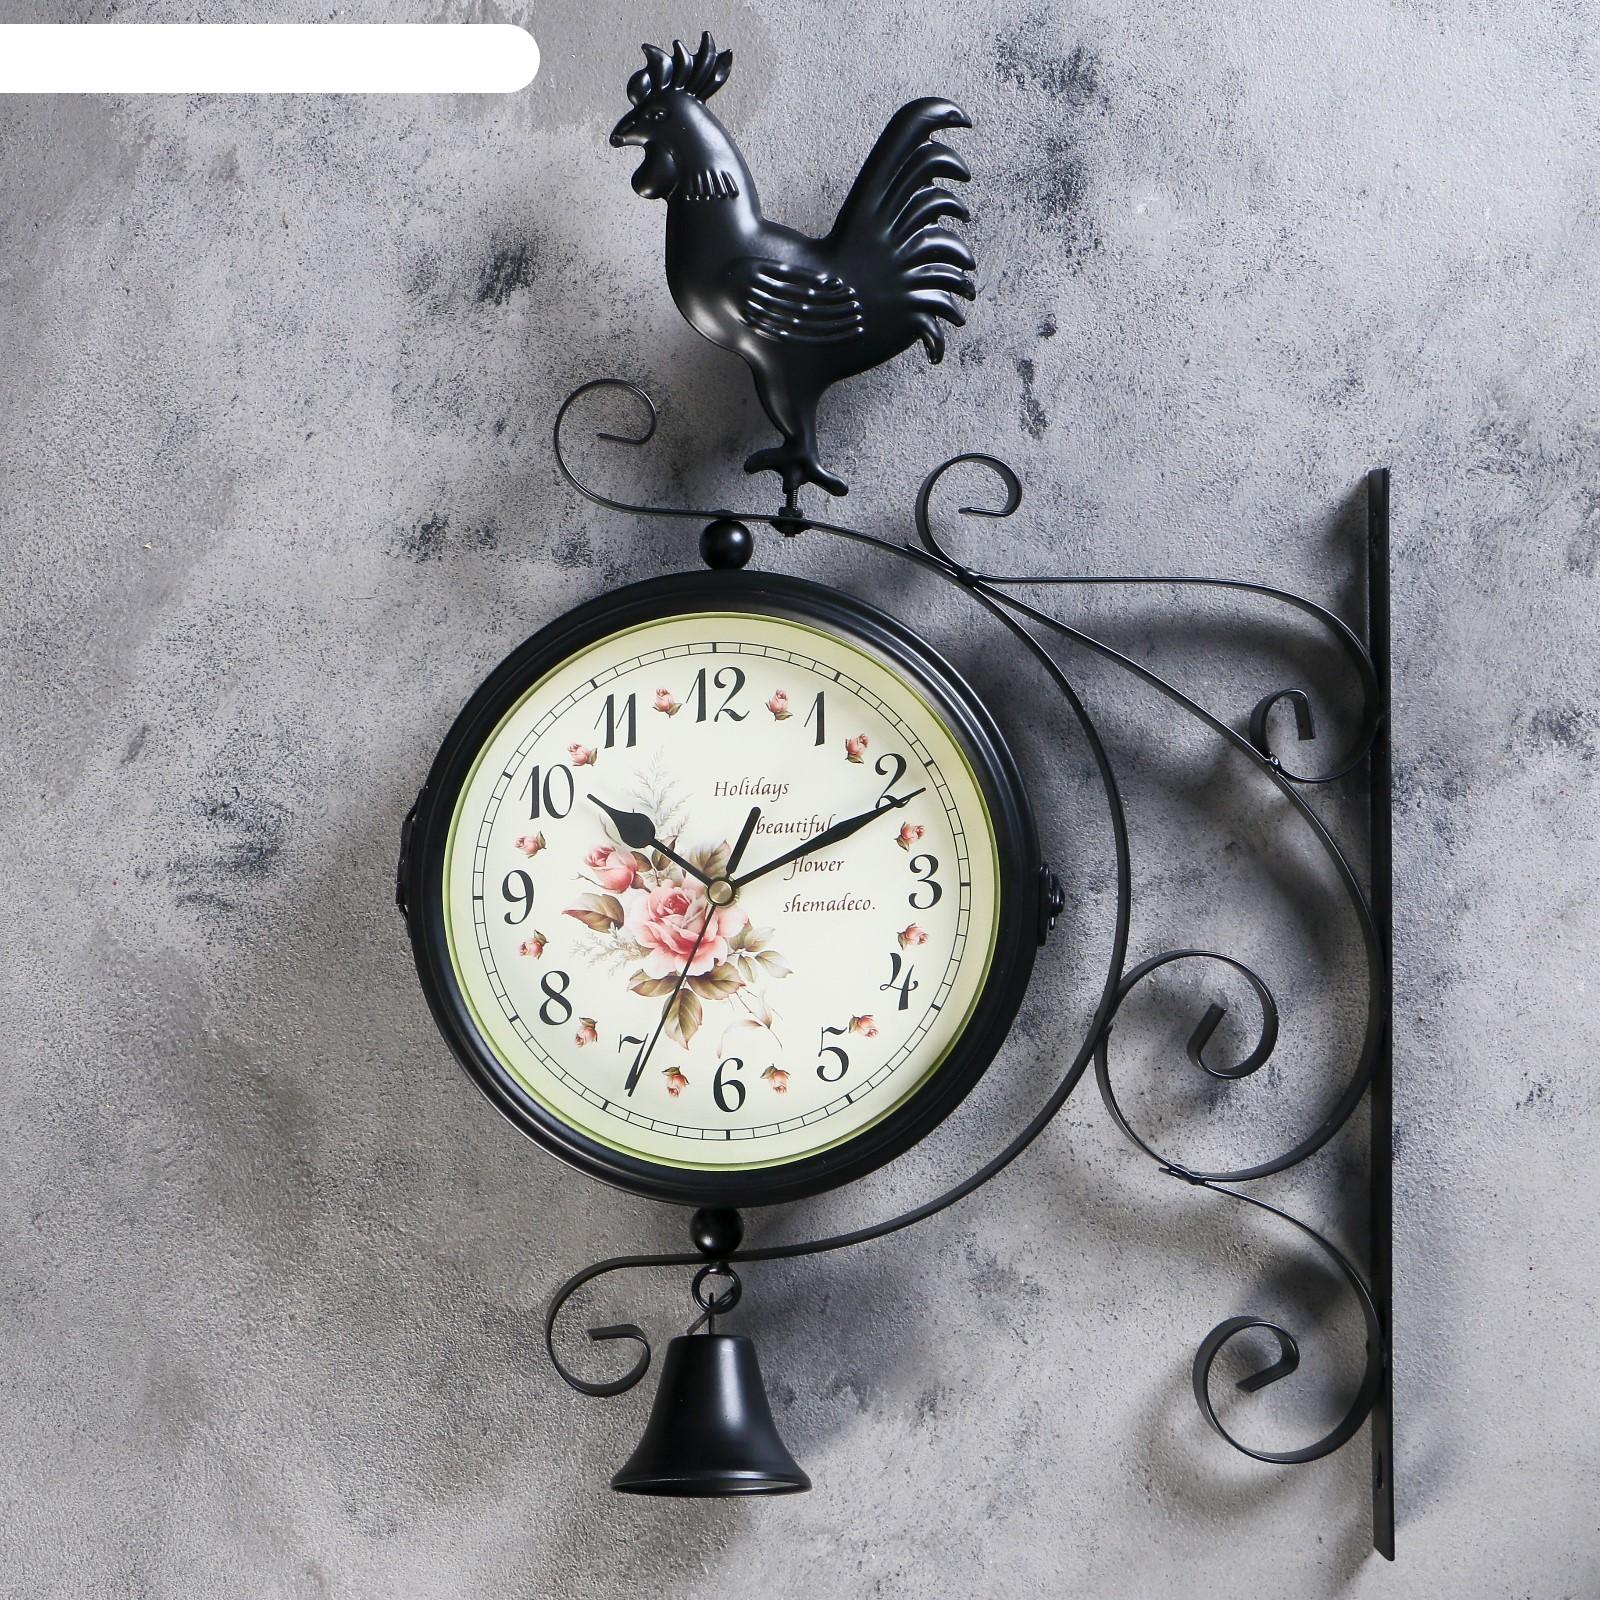 Часы настенные двойные, серия: Садовые, Флюгер, 32х48 см